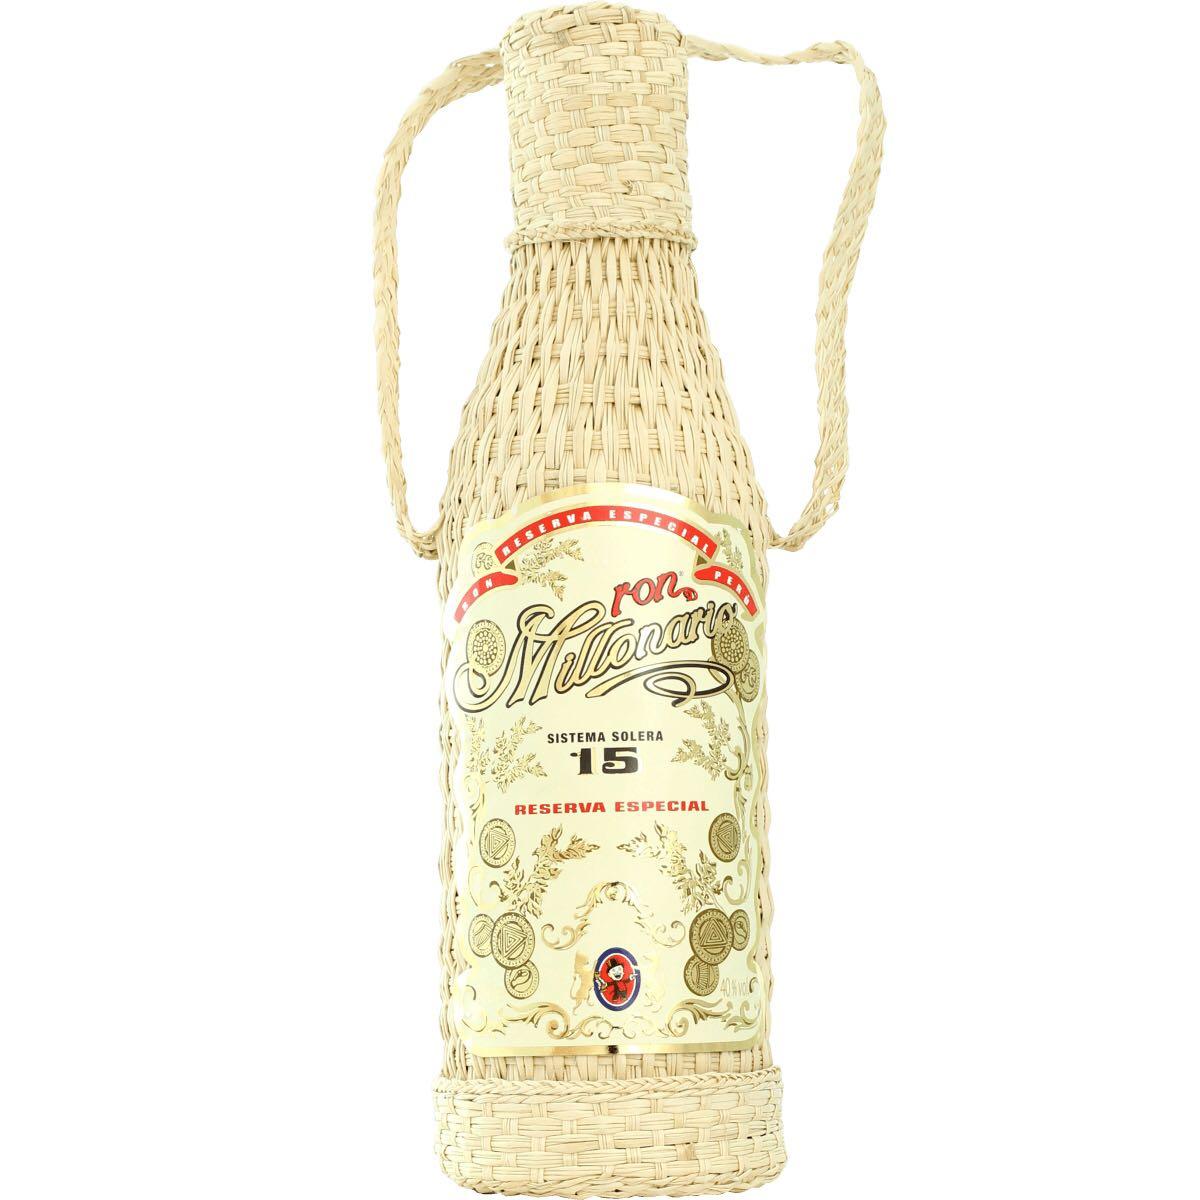 Bottle image of Millonario Solera 15 Reserva Especial